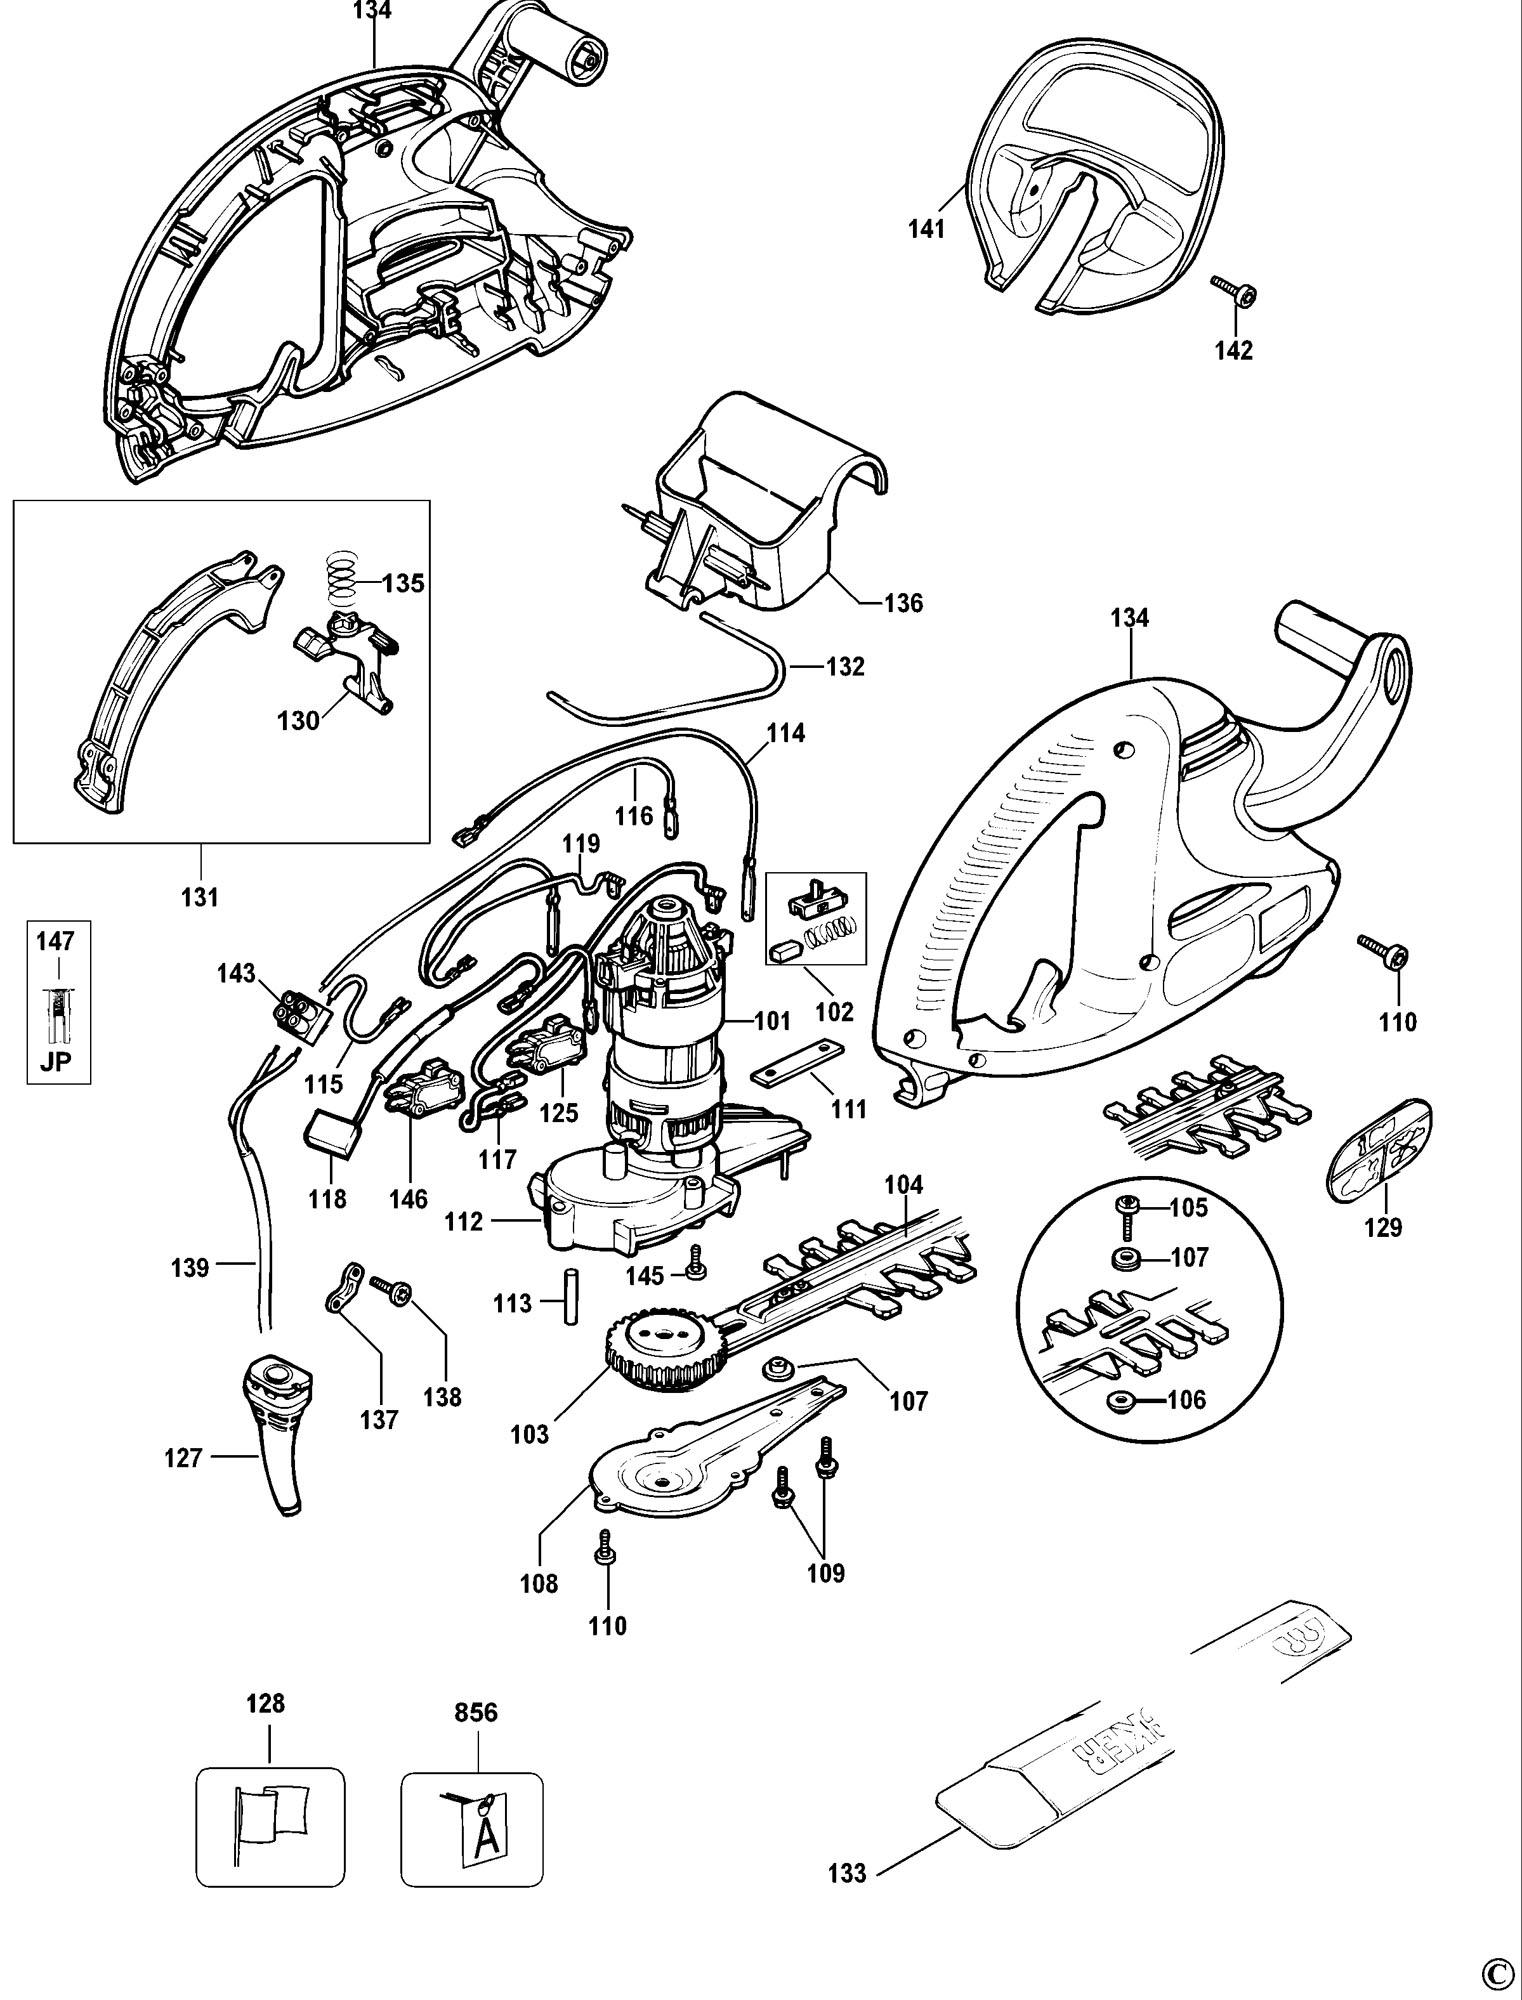 Spares For Black Amp Decker Gt350 Hedgetrimmer Type 4